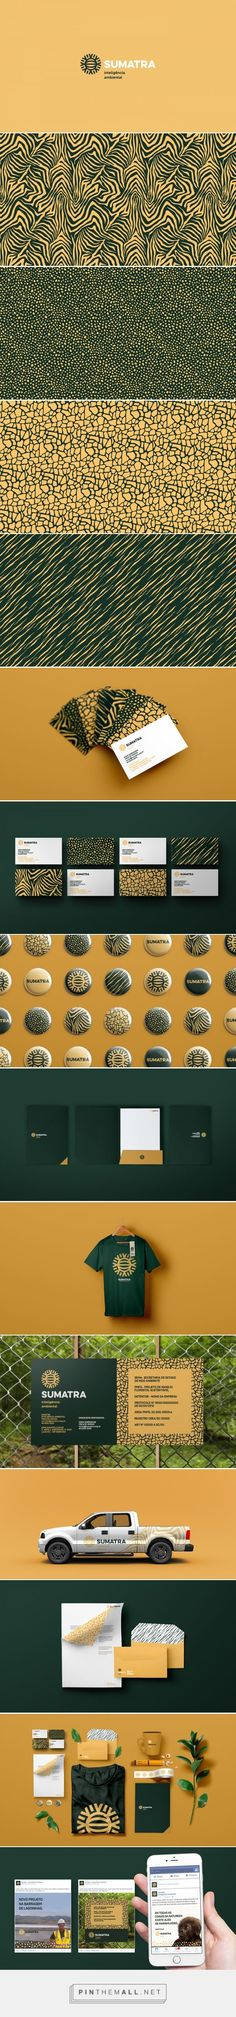 Sumatra intelligent environment Branding on Behance   Fivestar Branding – Design and Branding Agency & Inspiration Gallery